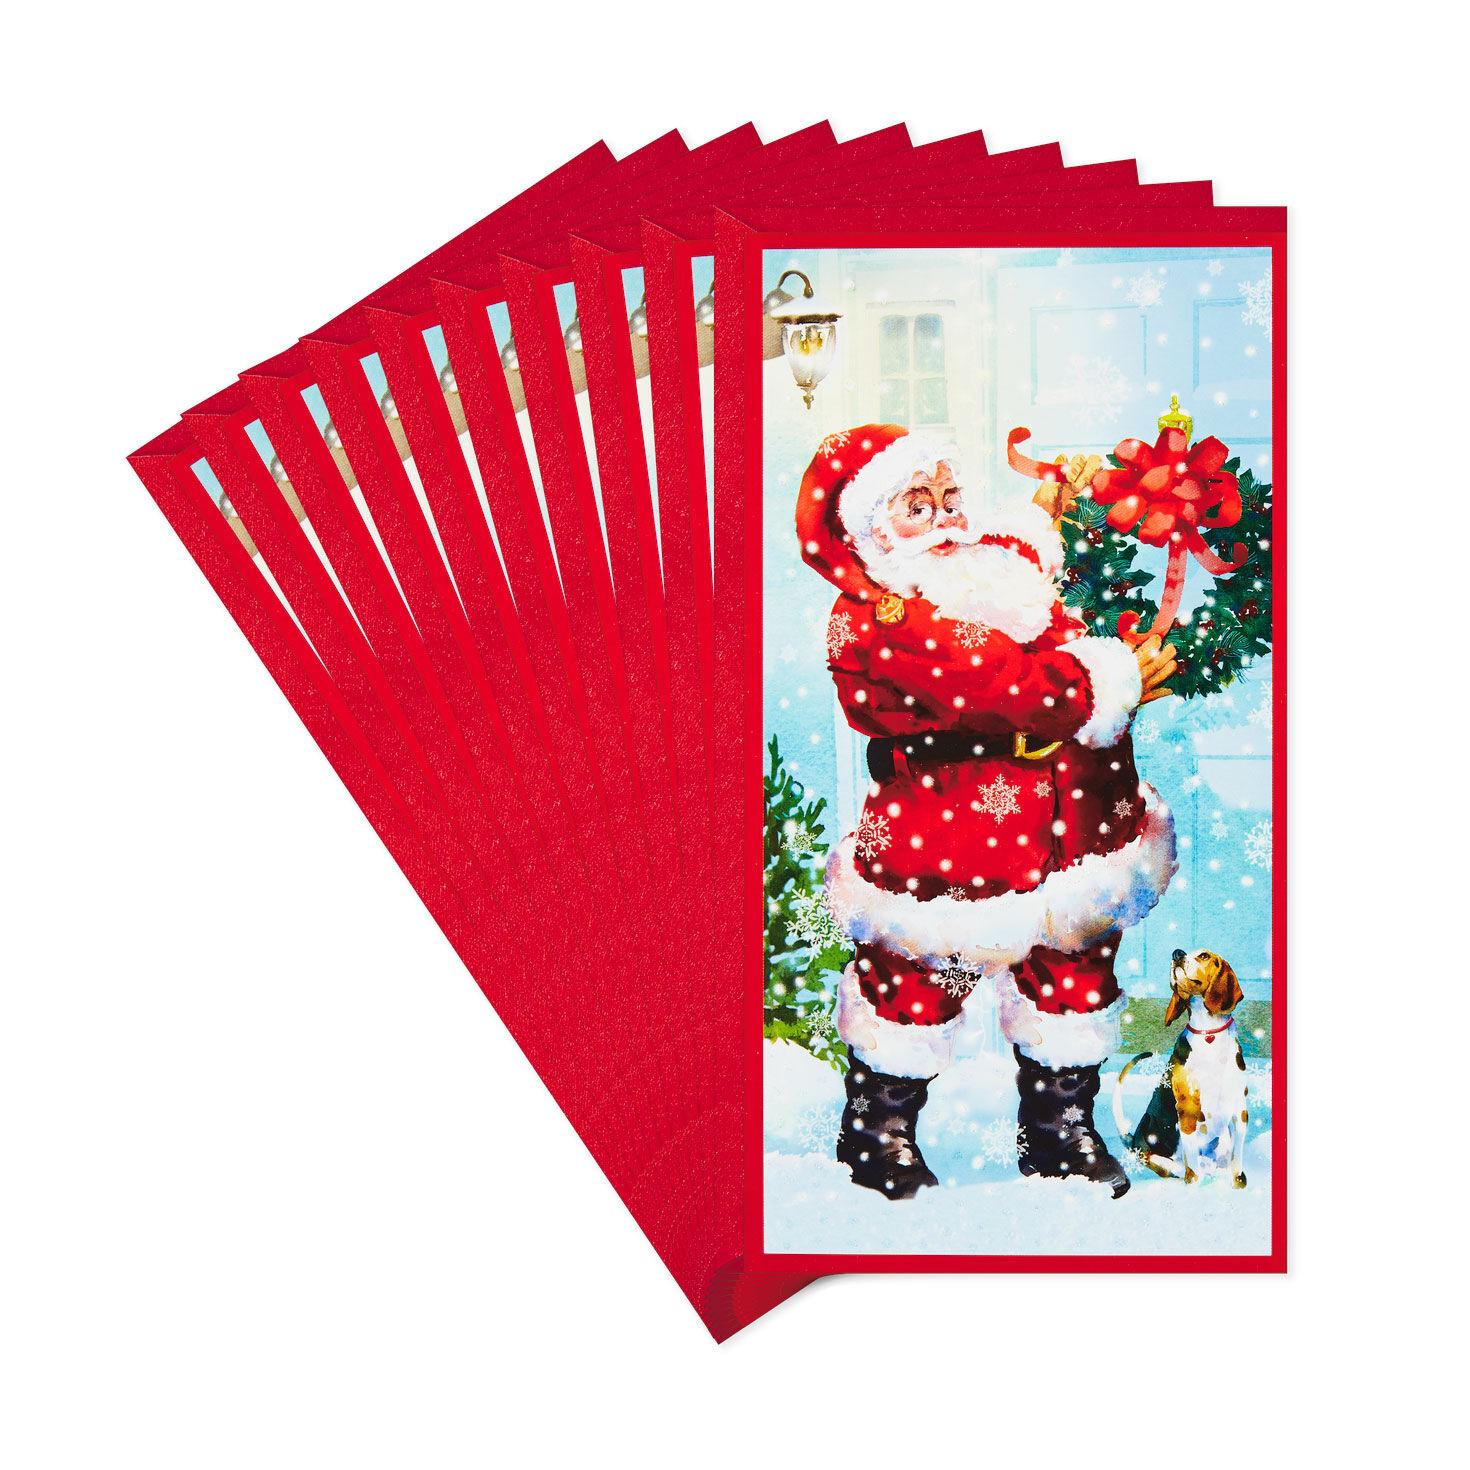 3 Bright Money Treat Gift Card Holders Santa Christmas Holiday New 4 x 2 x 1